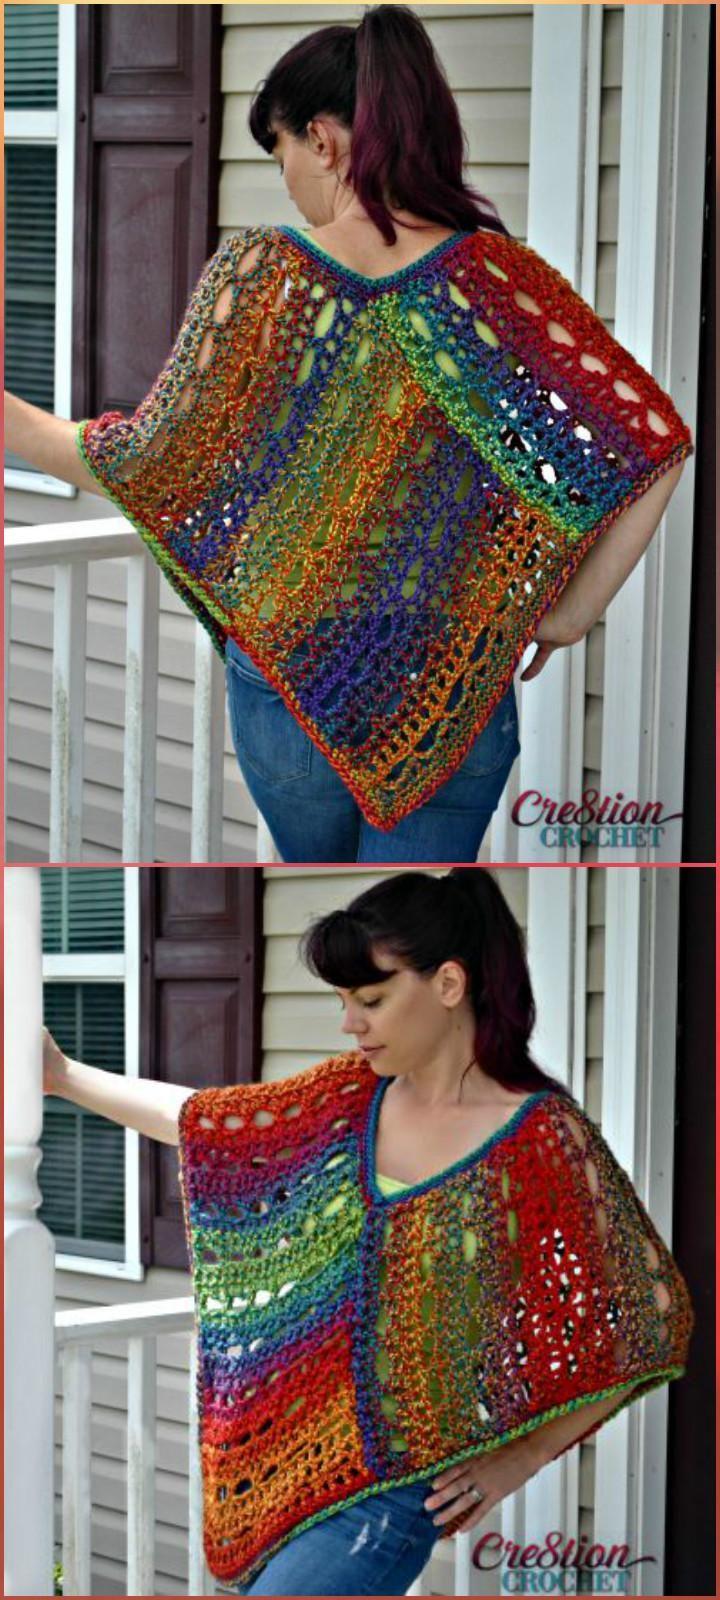 50 Free Crochet Poncho Patterns for All | Free crochet poncho ...